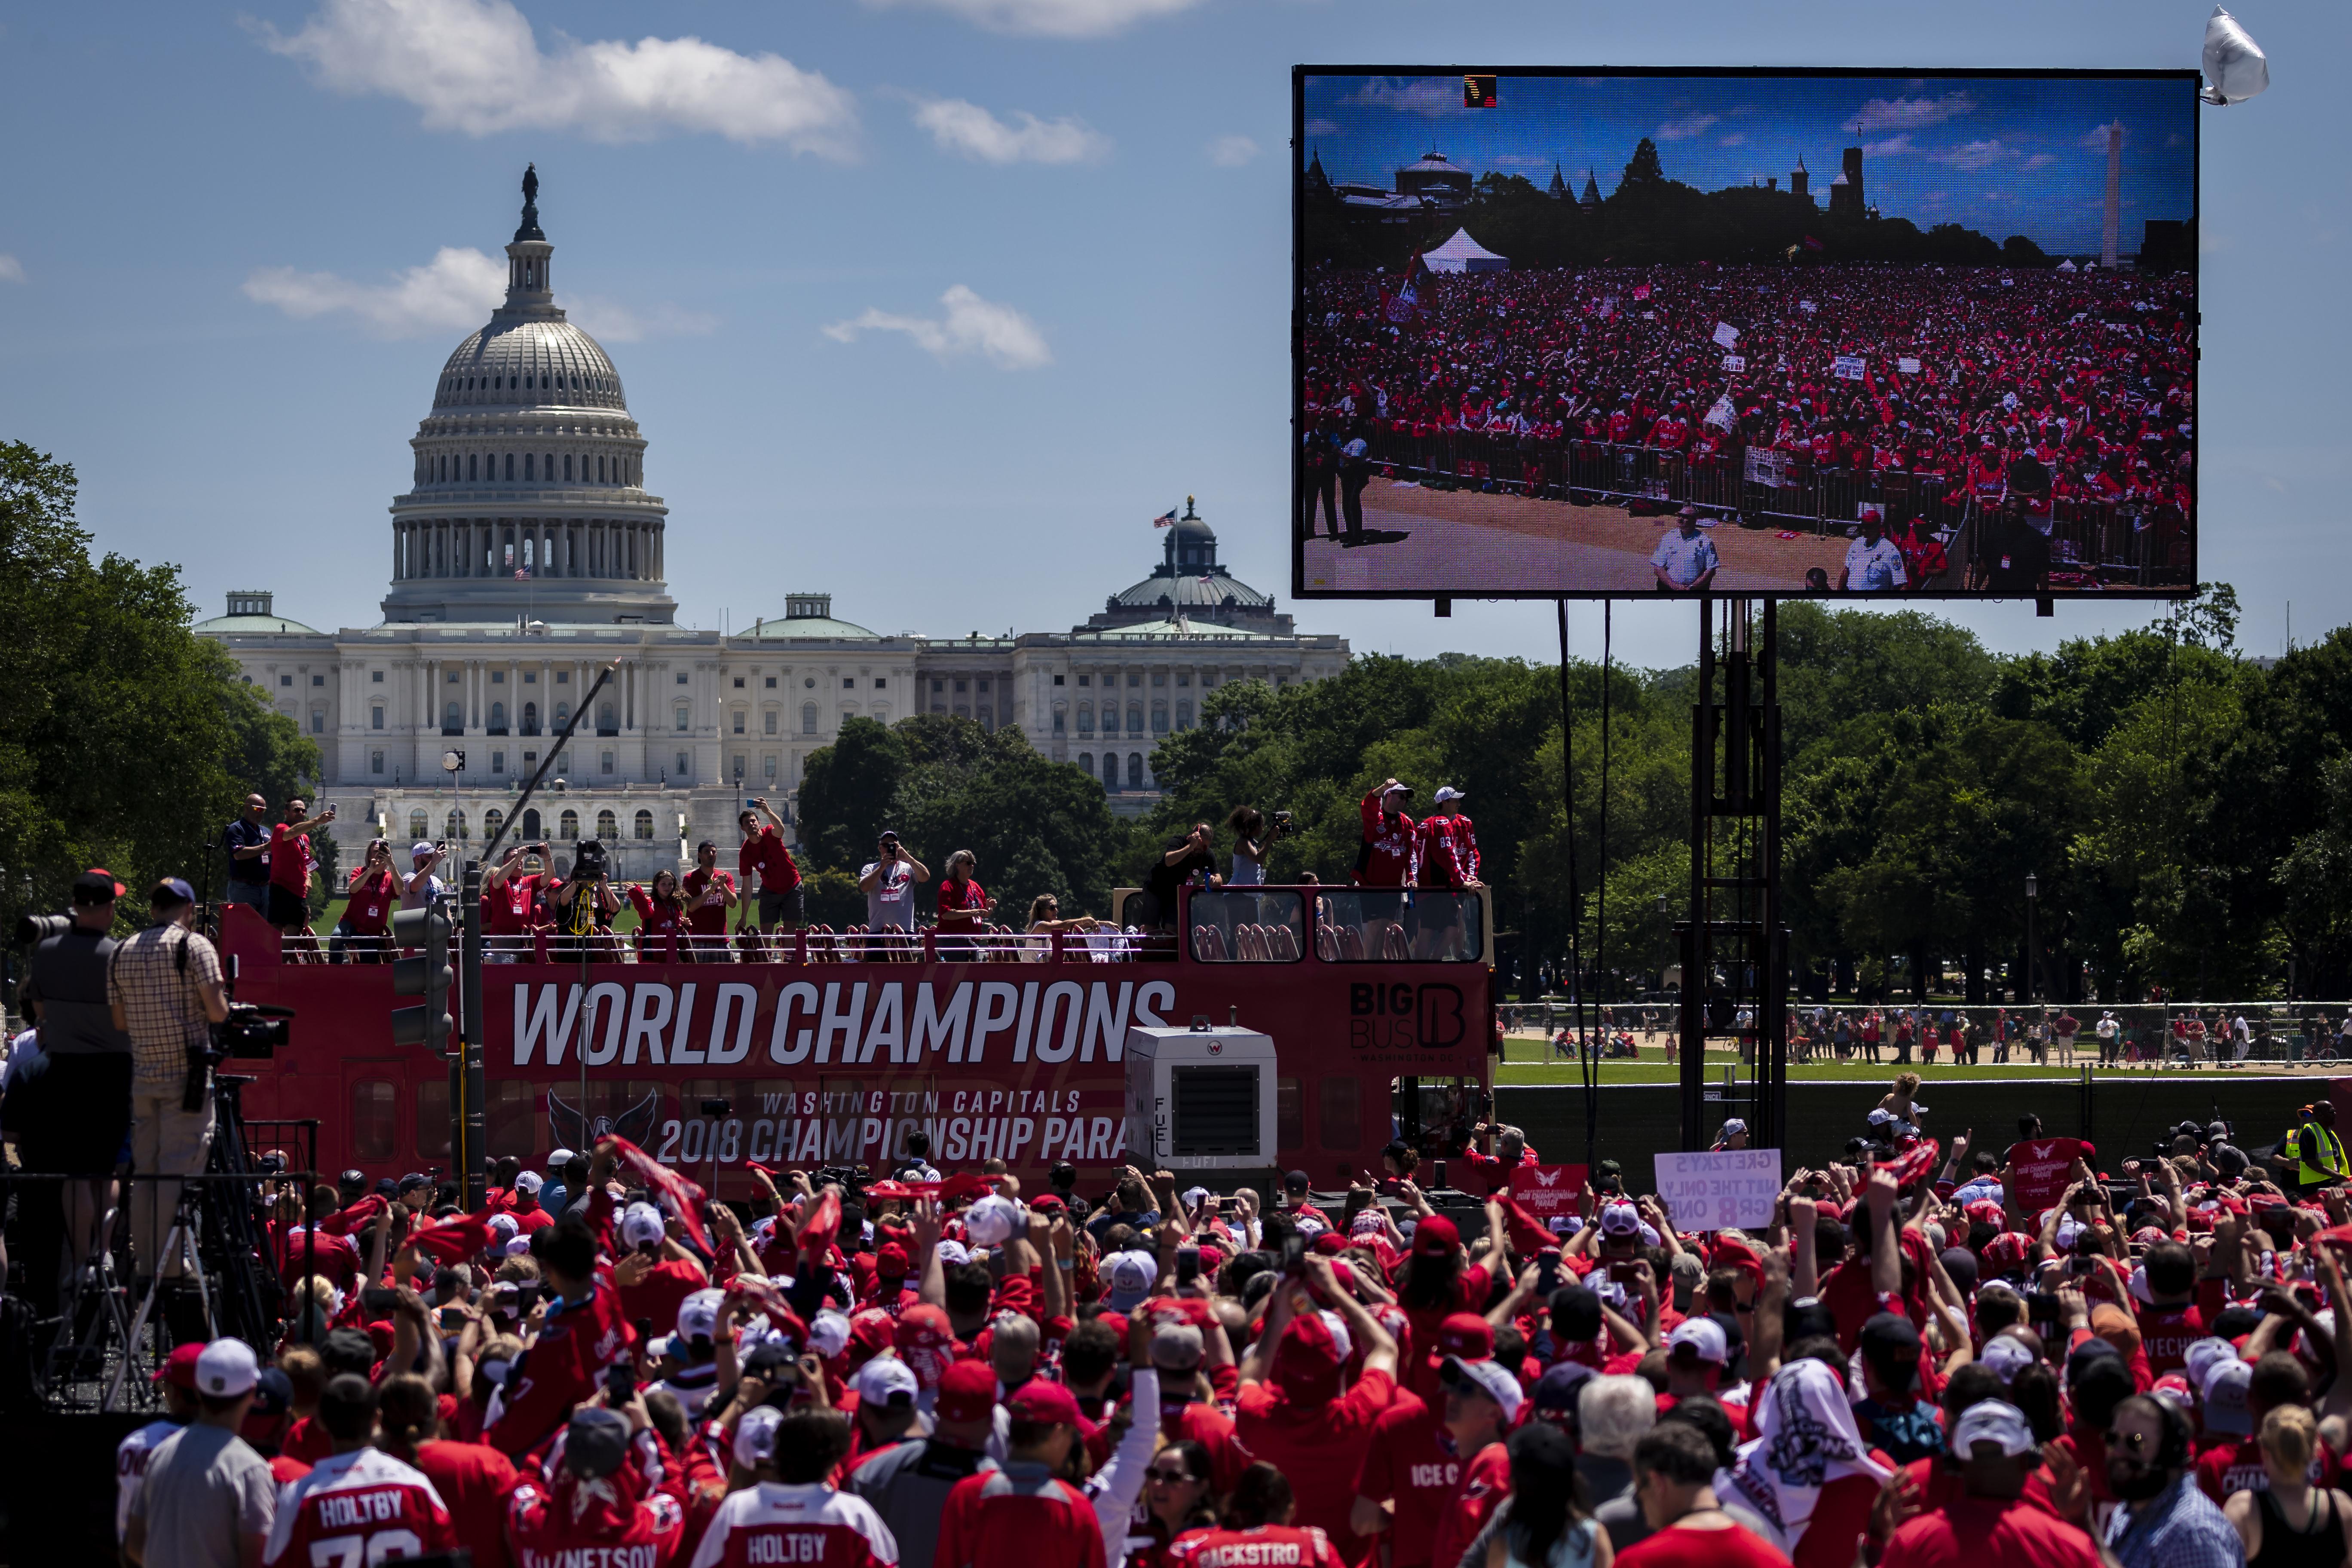 Washington Capitals Victory Parade And Rally